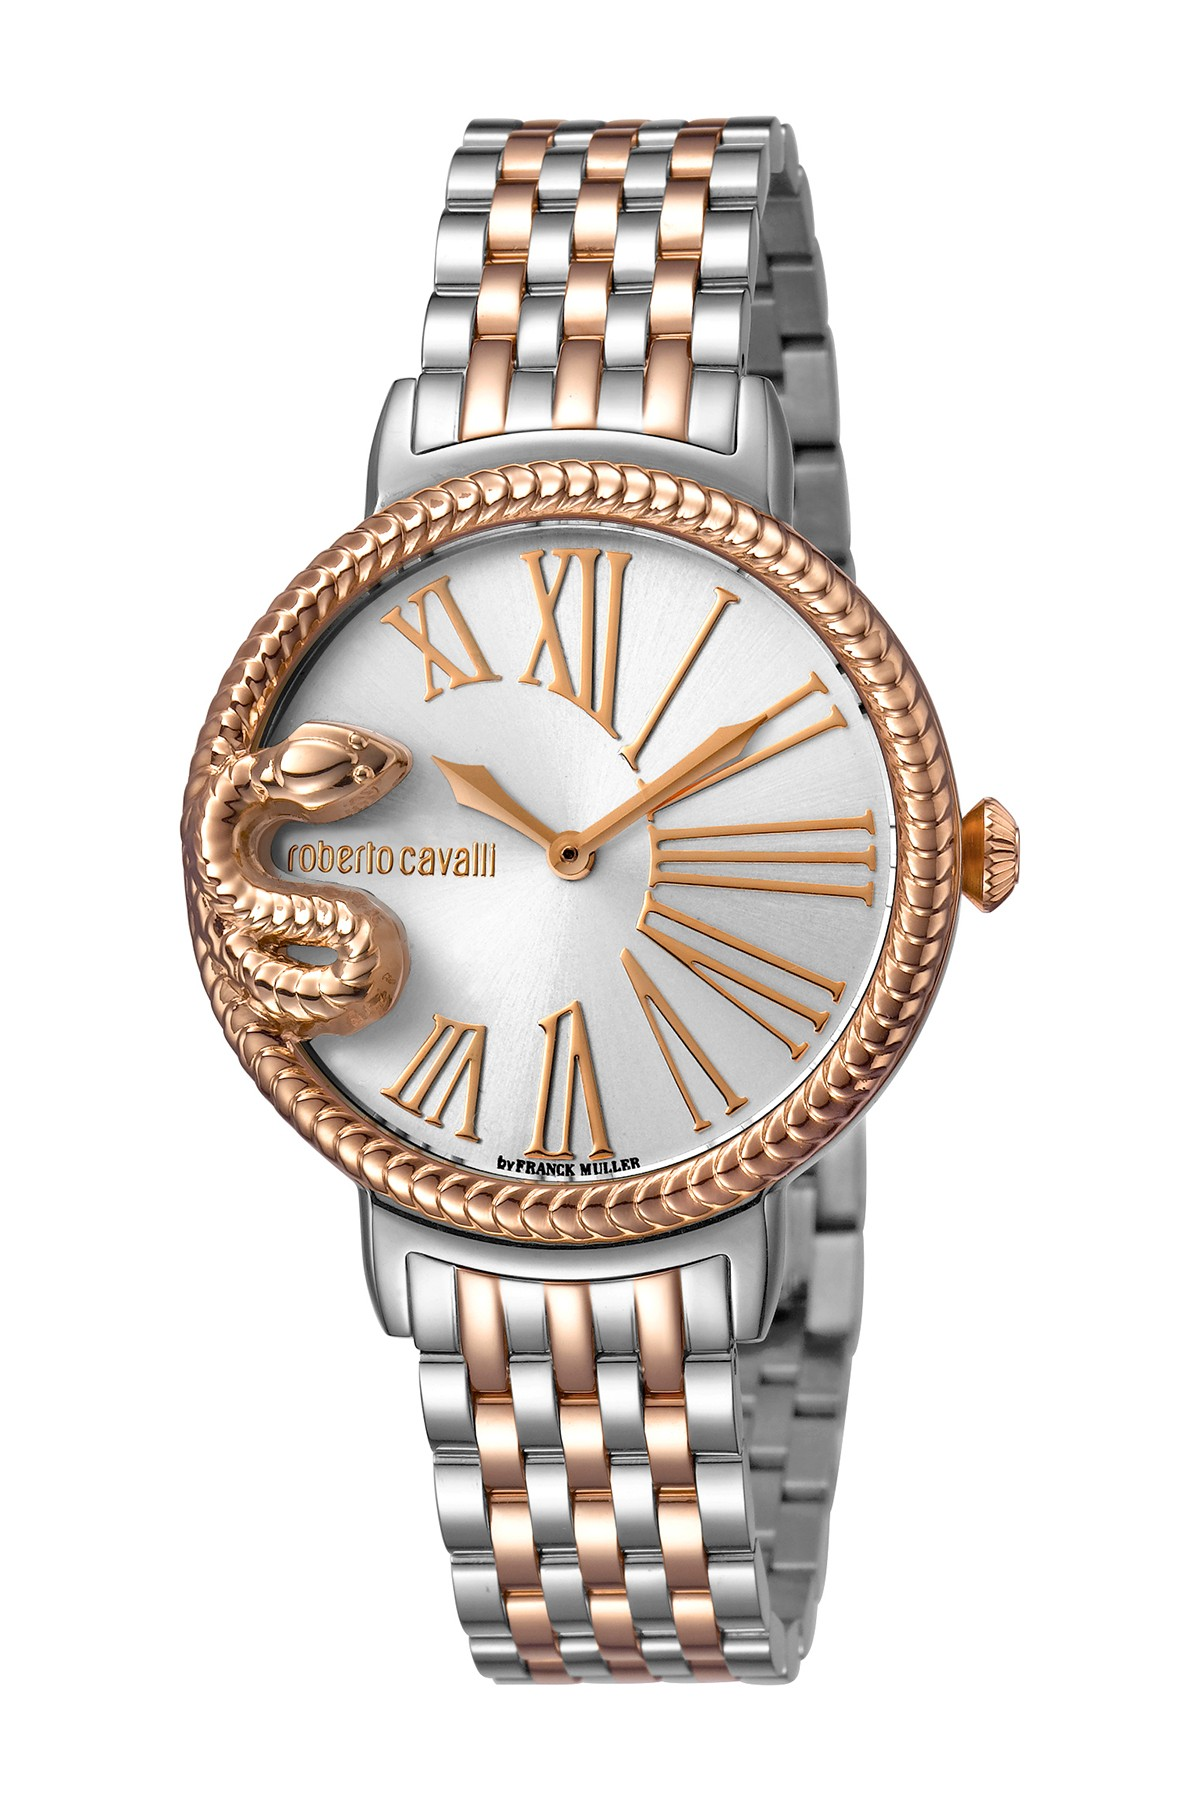 83d83631d8 ROBERTO CAVALLI BY FRANCK MULLER Women s Snake Two-Tone Bracelet Watch